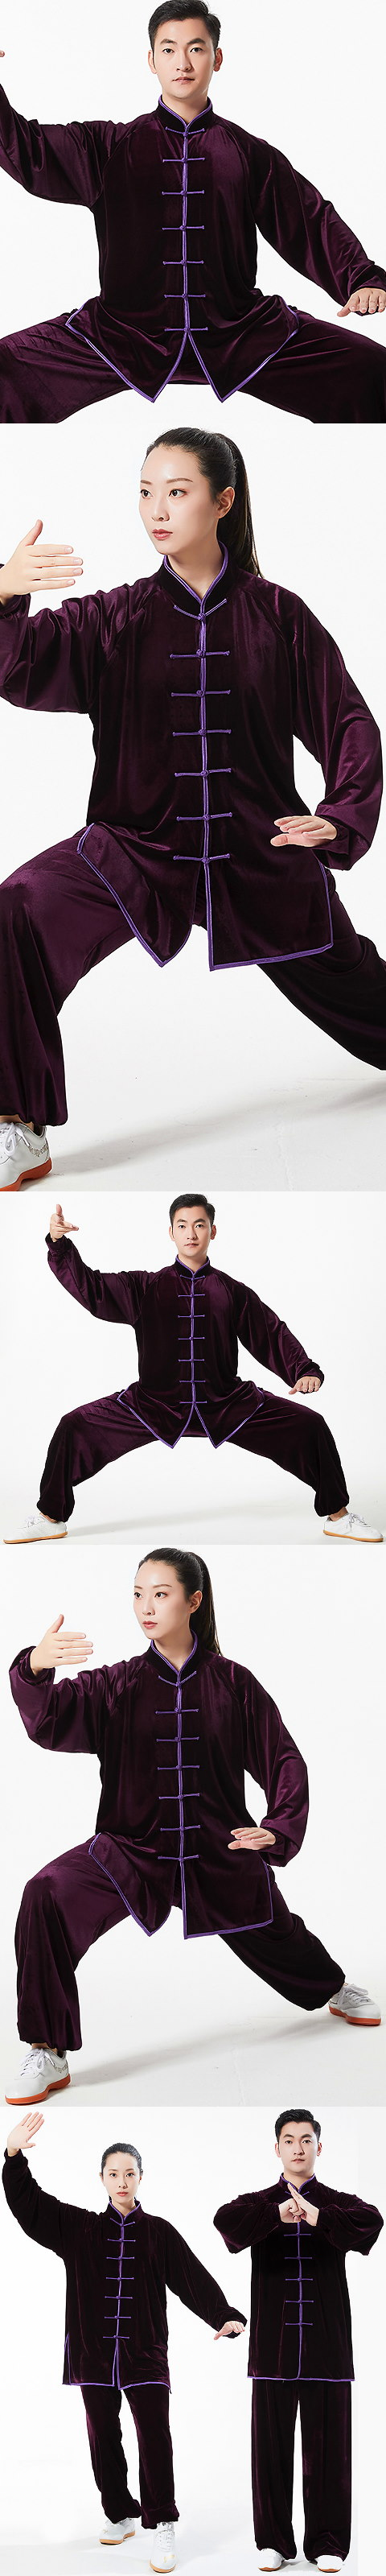 Professional Taichi Kungfu Uniform with Pants - Velvet - Purple (RM)